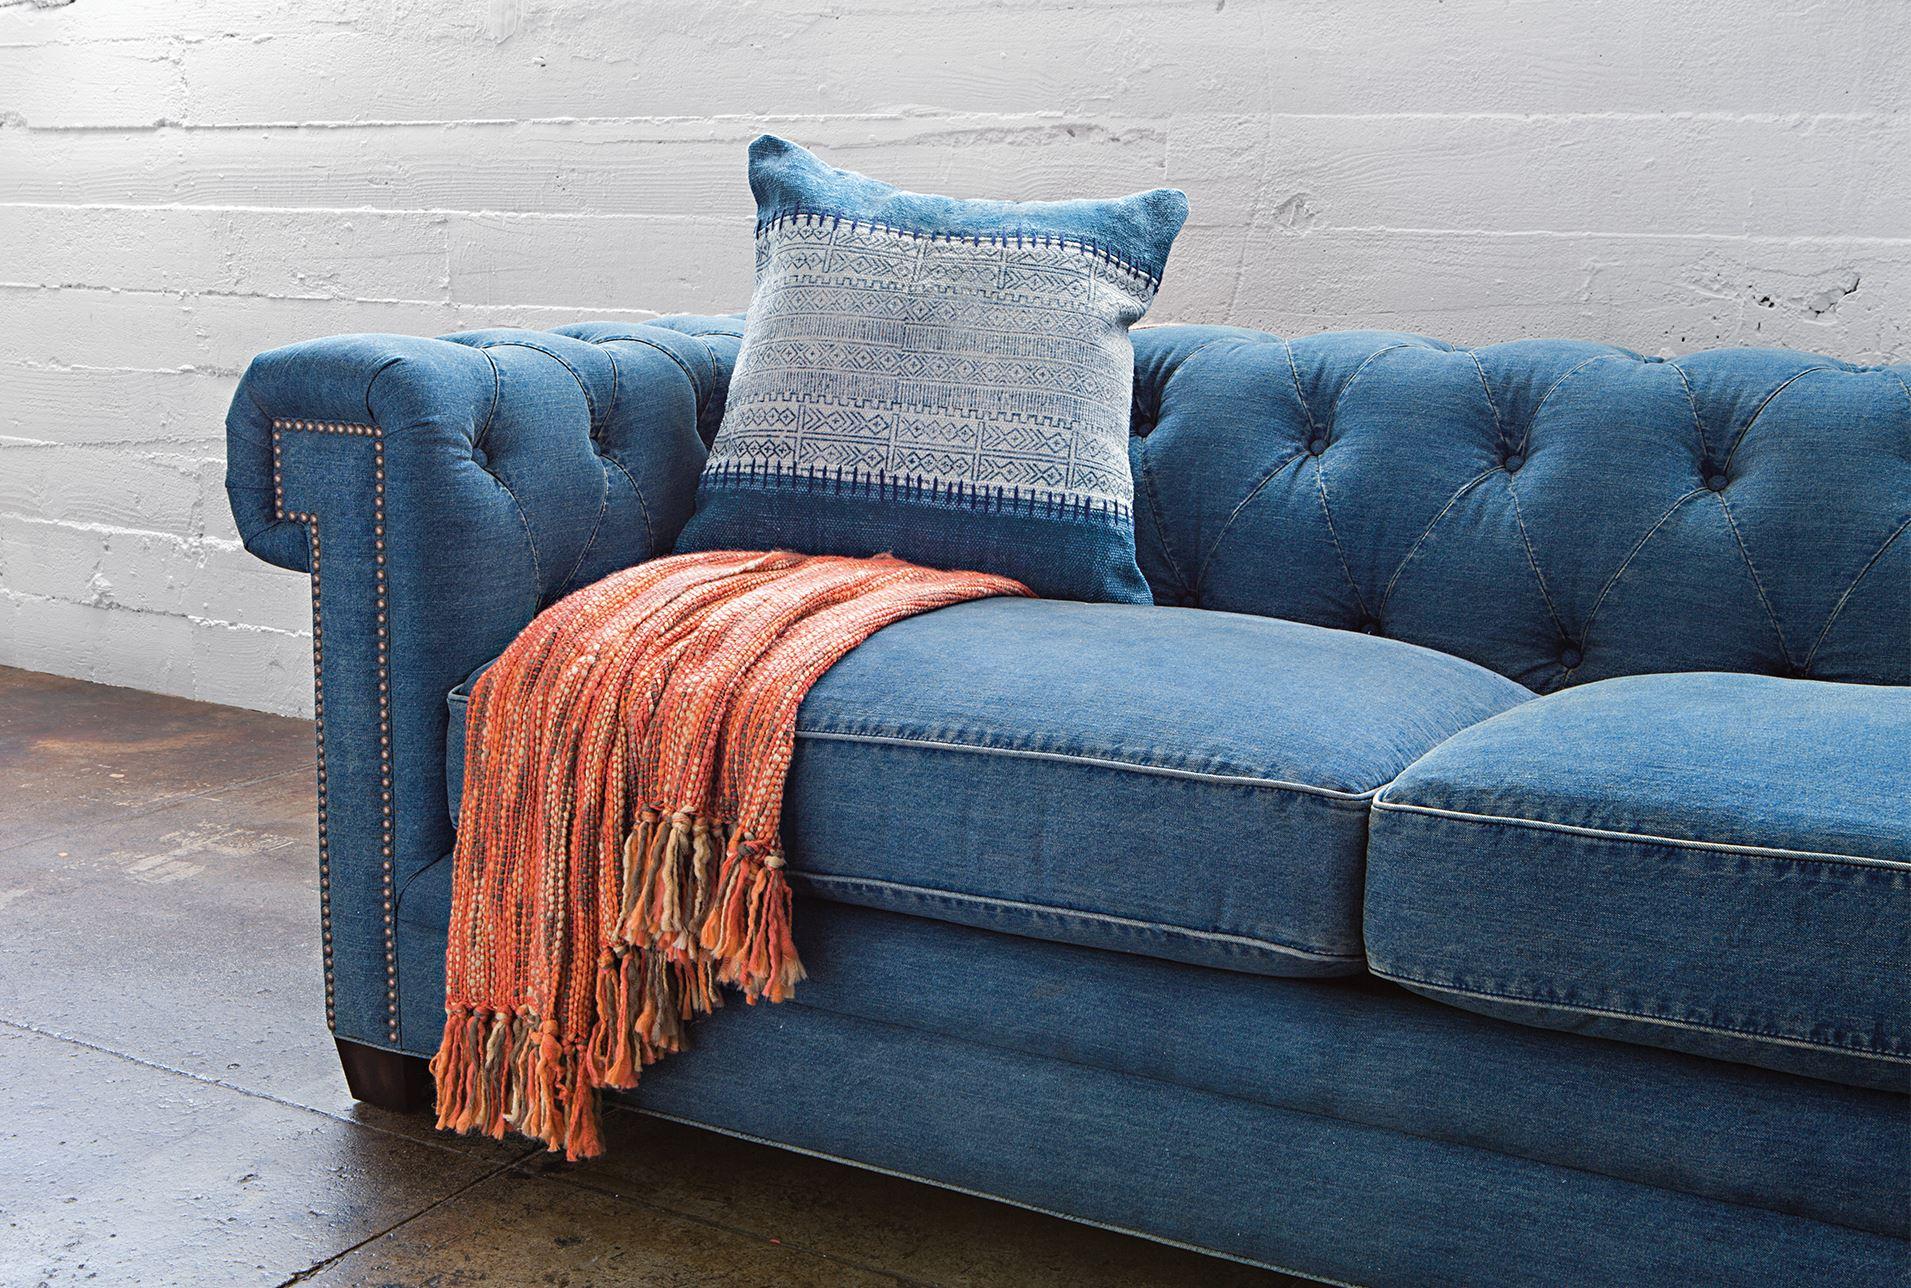 Merveilleux Denim Tufted Sofa   360 Elements